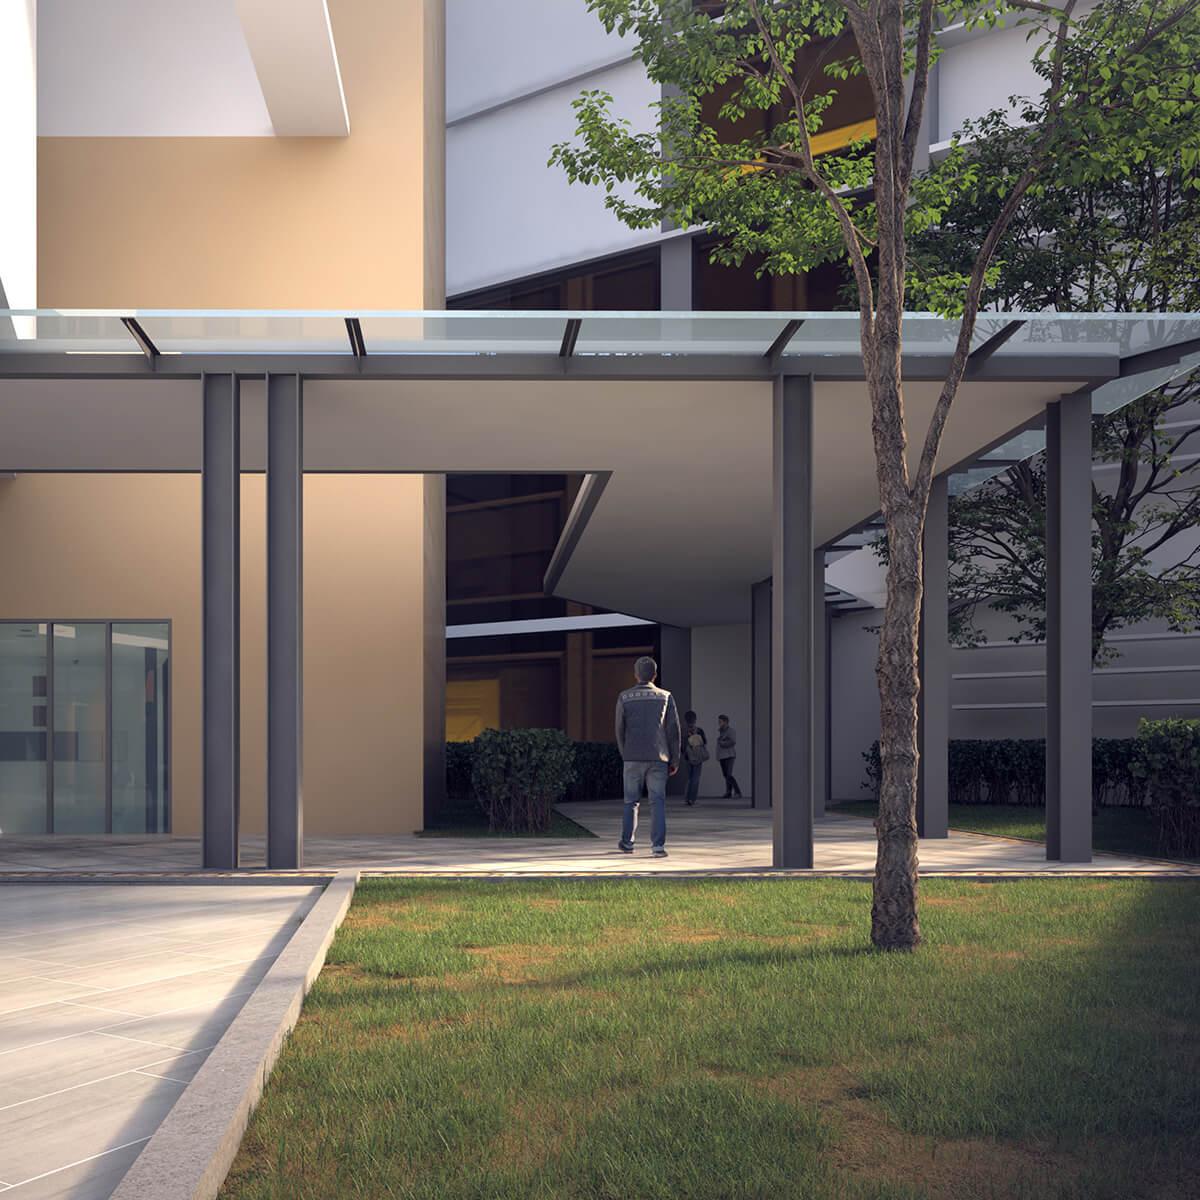 THKD Thomson Hospital Expansion 3